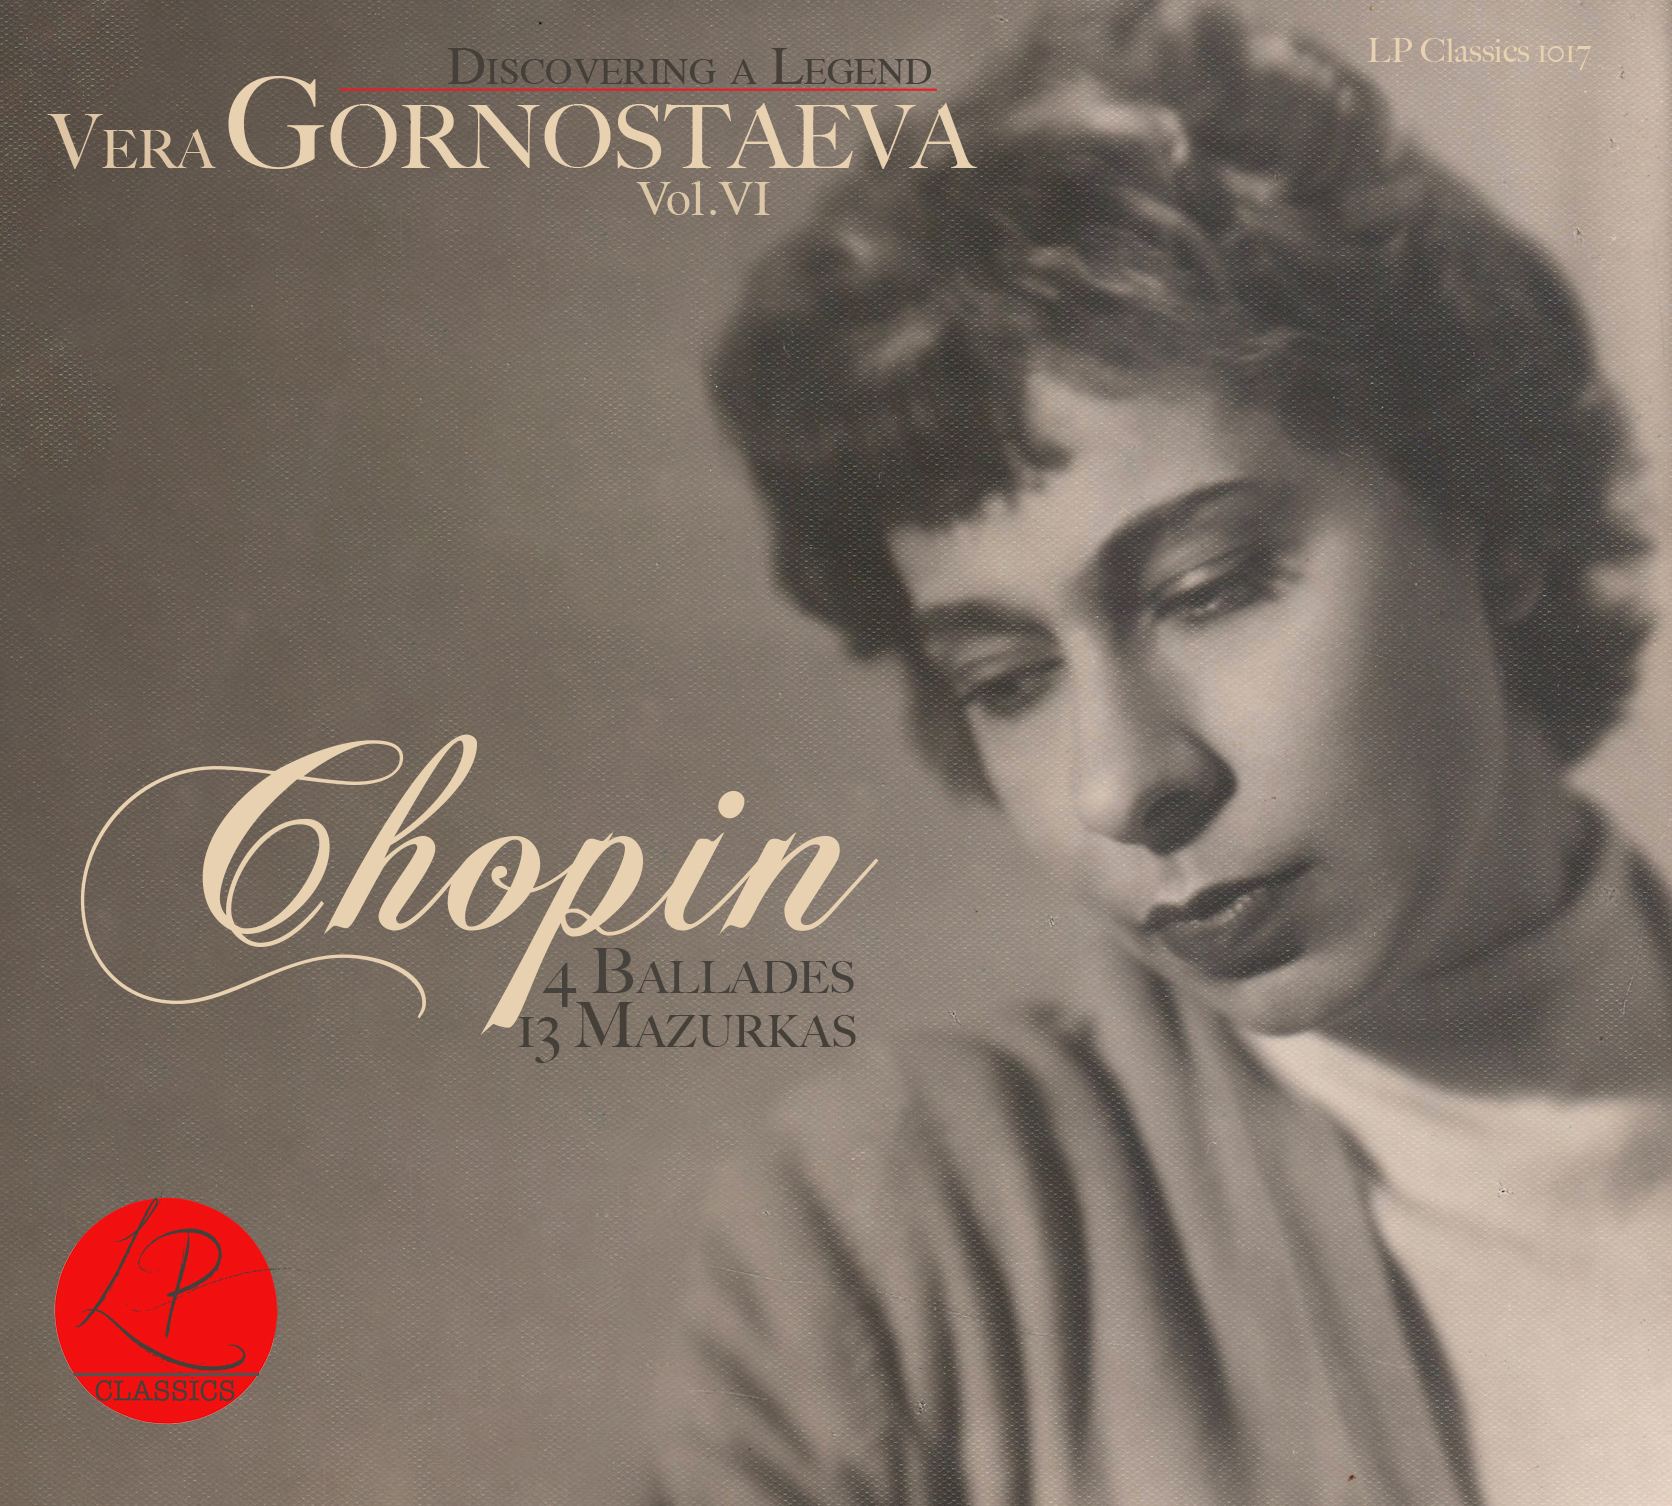 Vera Gornostaeva | Vol VI | Chopin – 4 Ballades & 13 Mazurkas